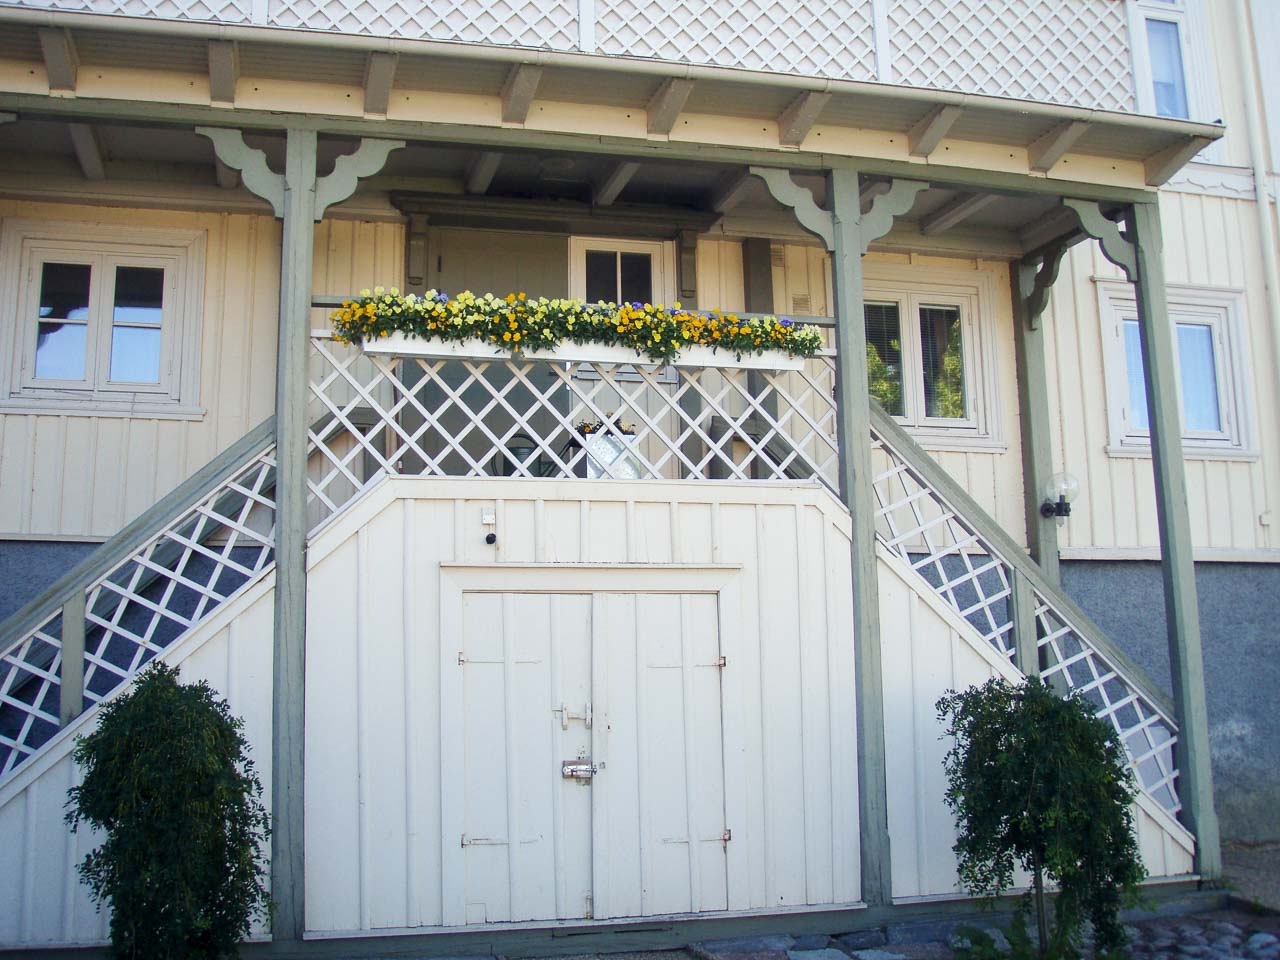 Brahegatan 75, Gränna